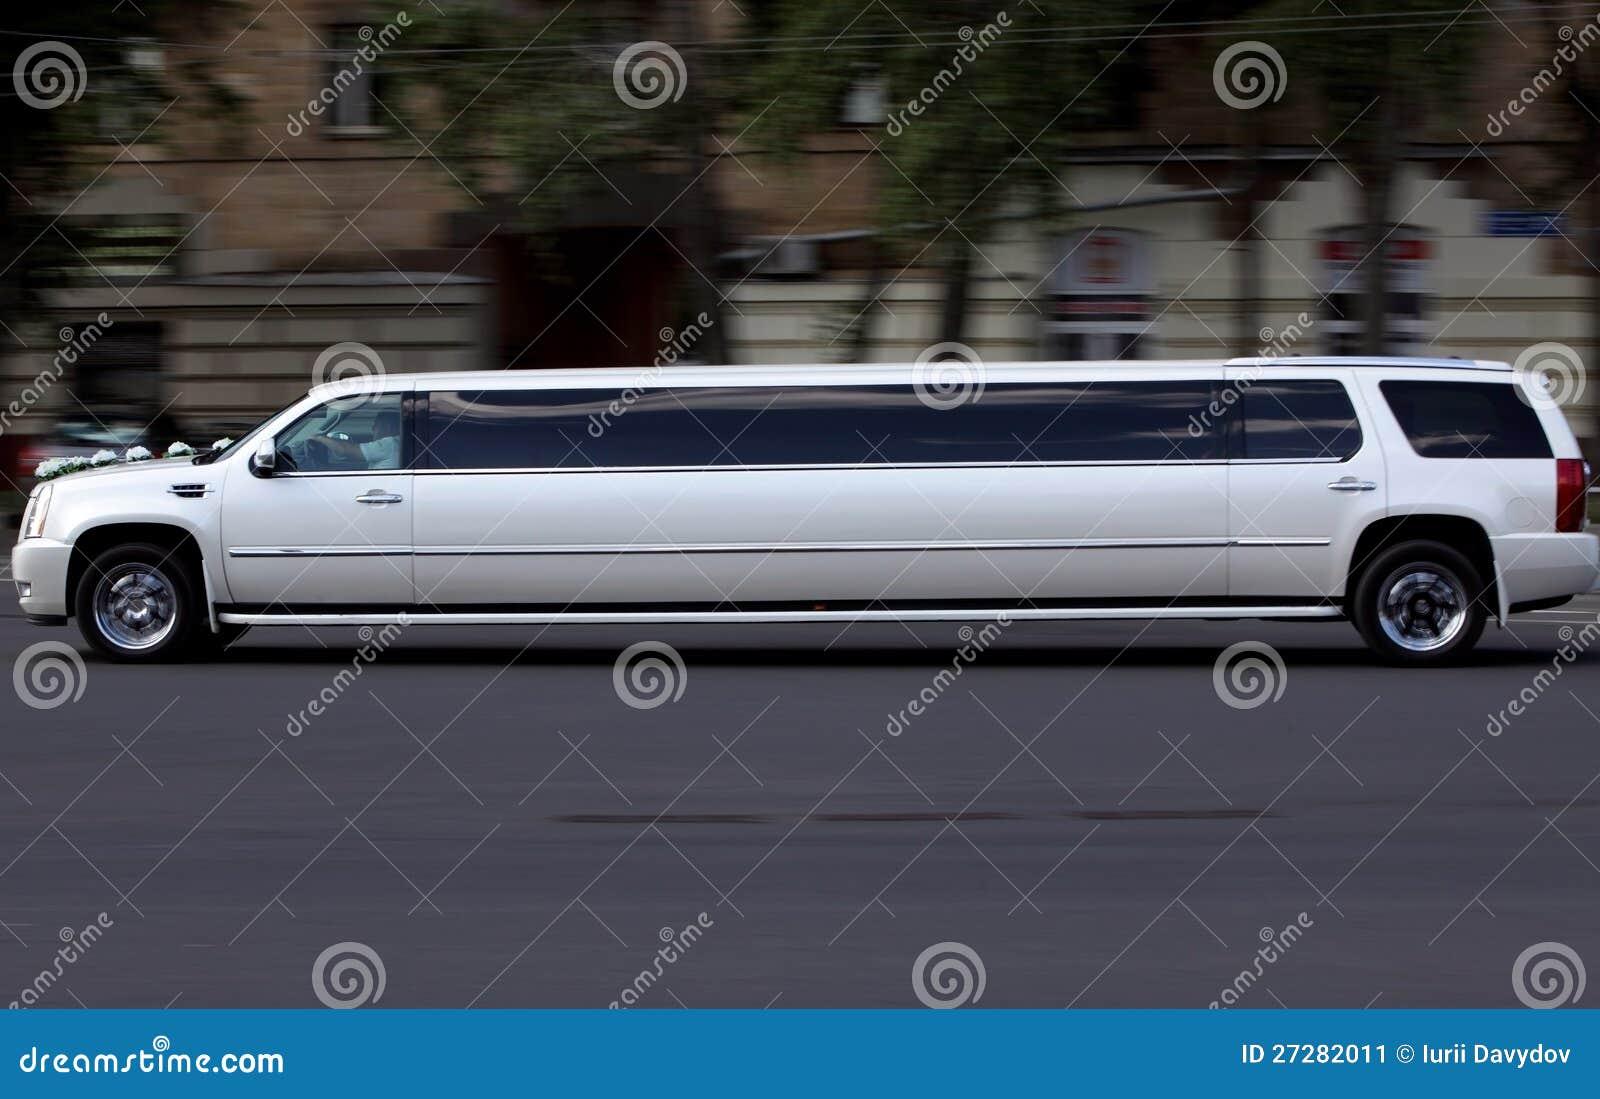 Green Light Auto Credit >> Wedding White Luxury Long Car Stock Image - Image: 27282011